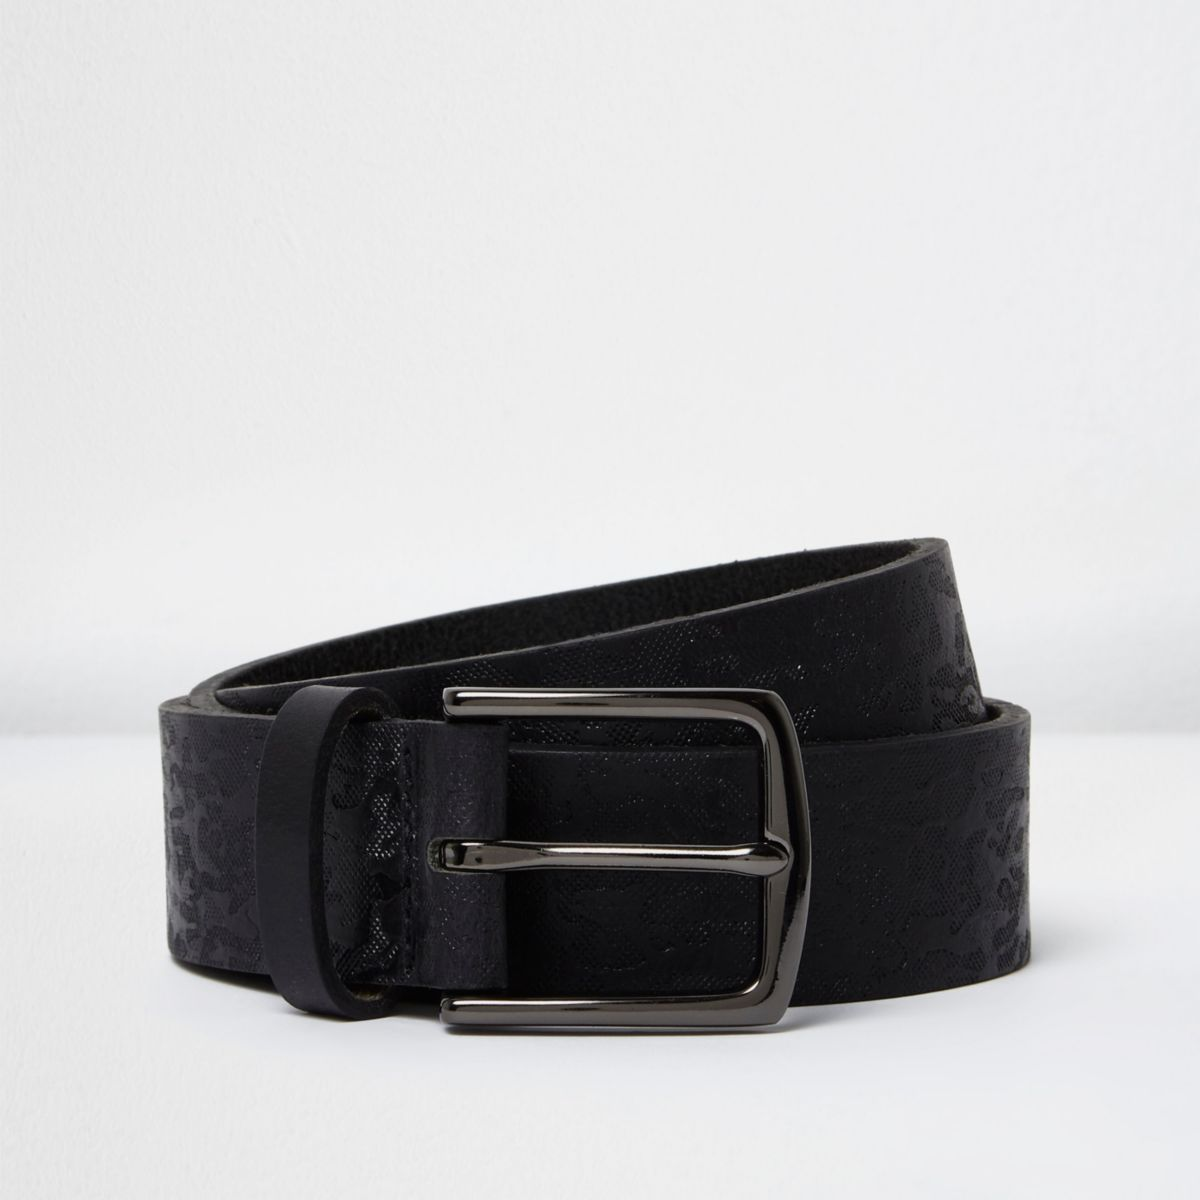 Black camo belt